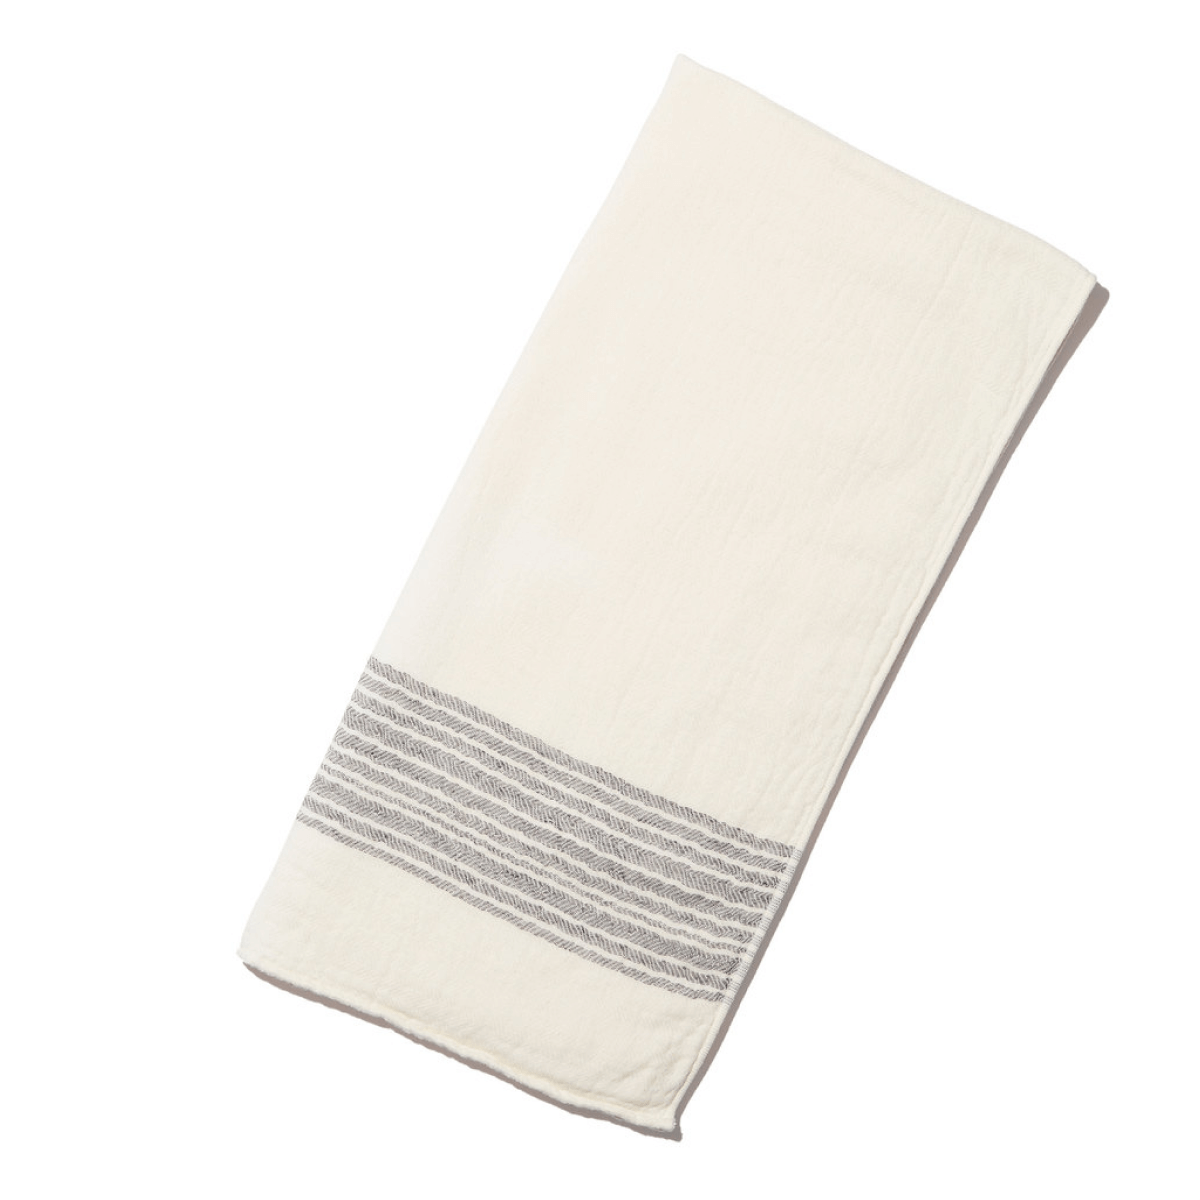 Flax Line Organics Bath Towel